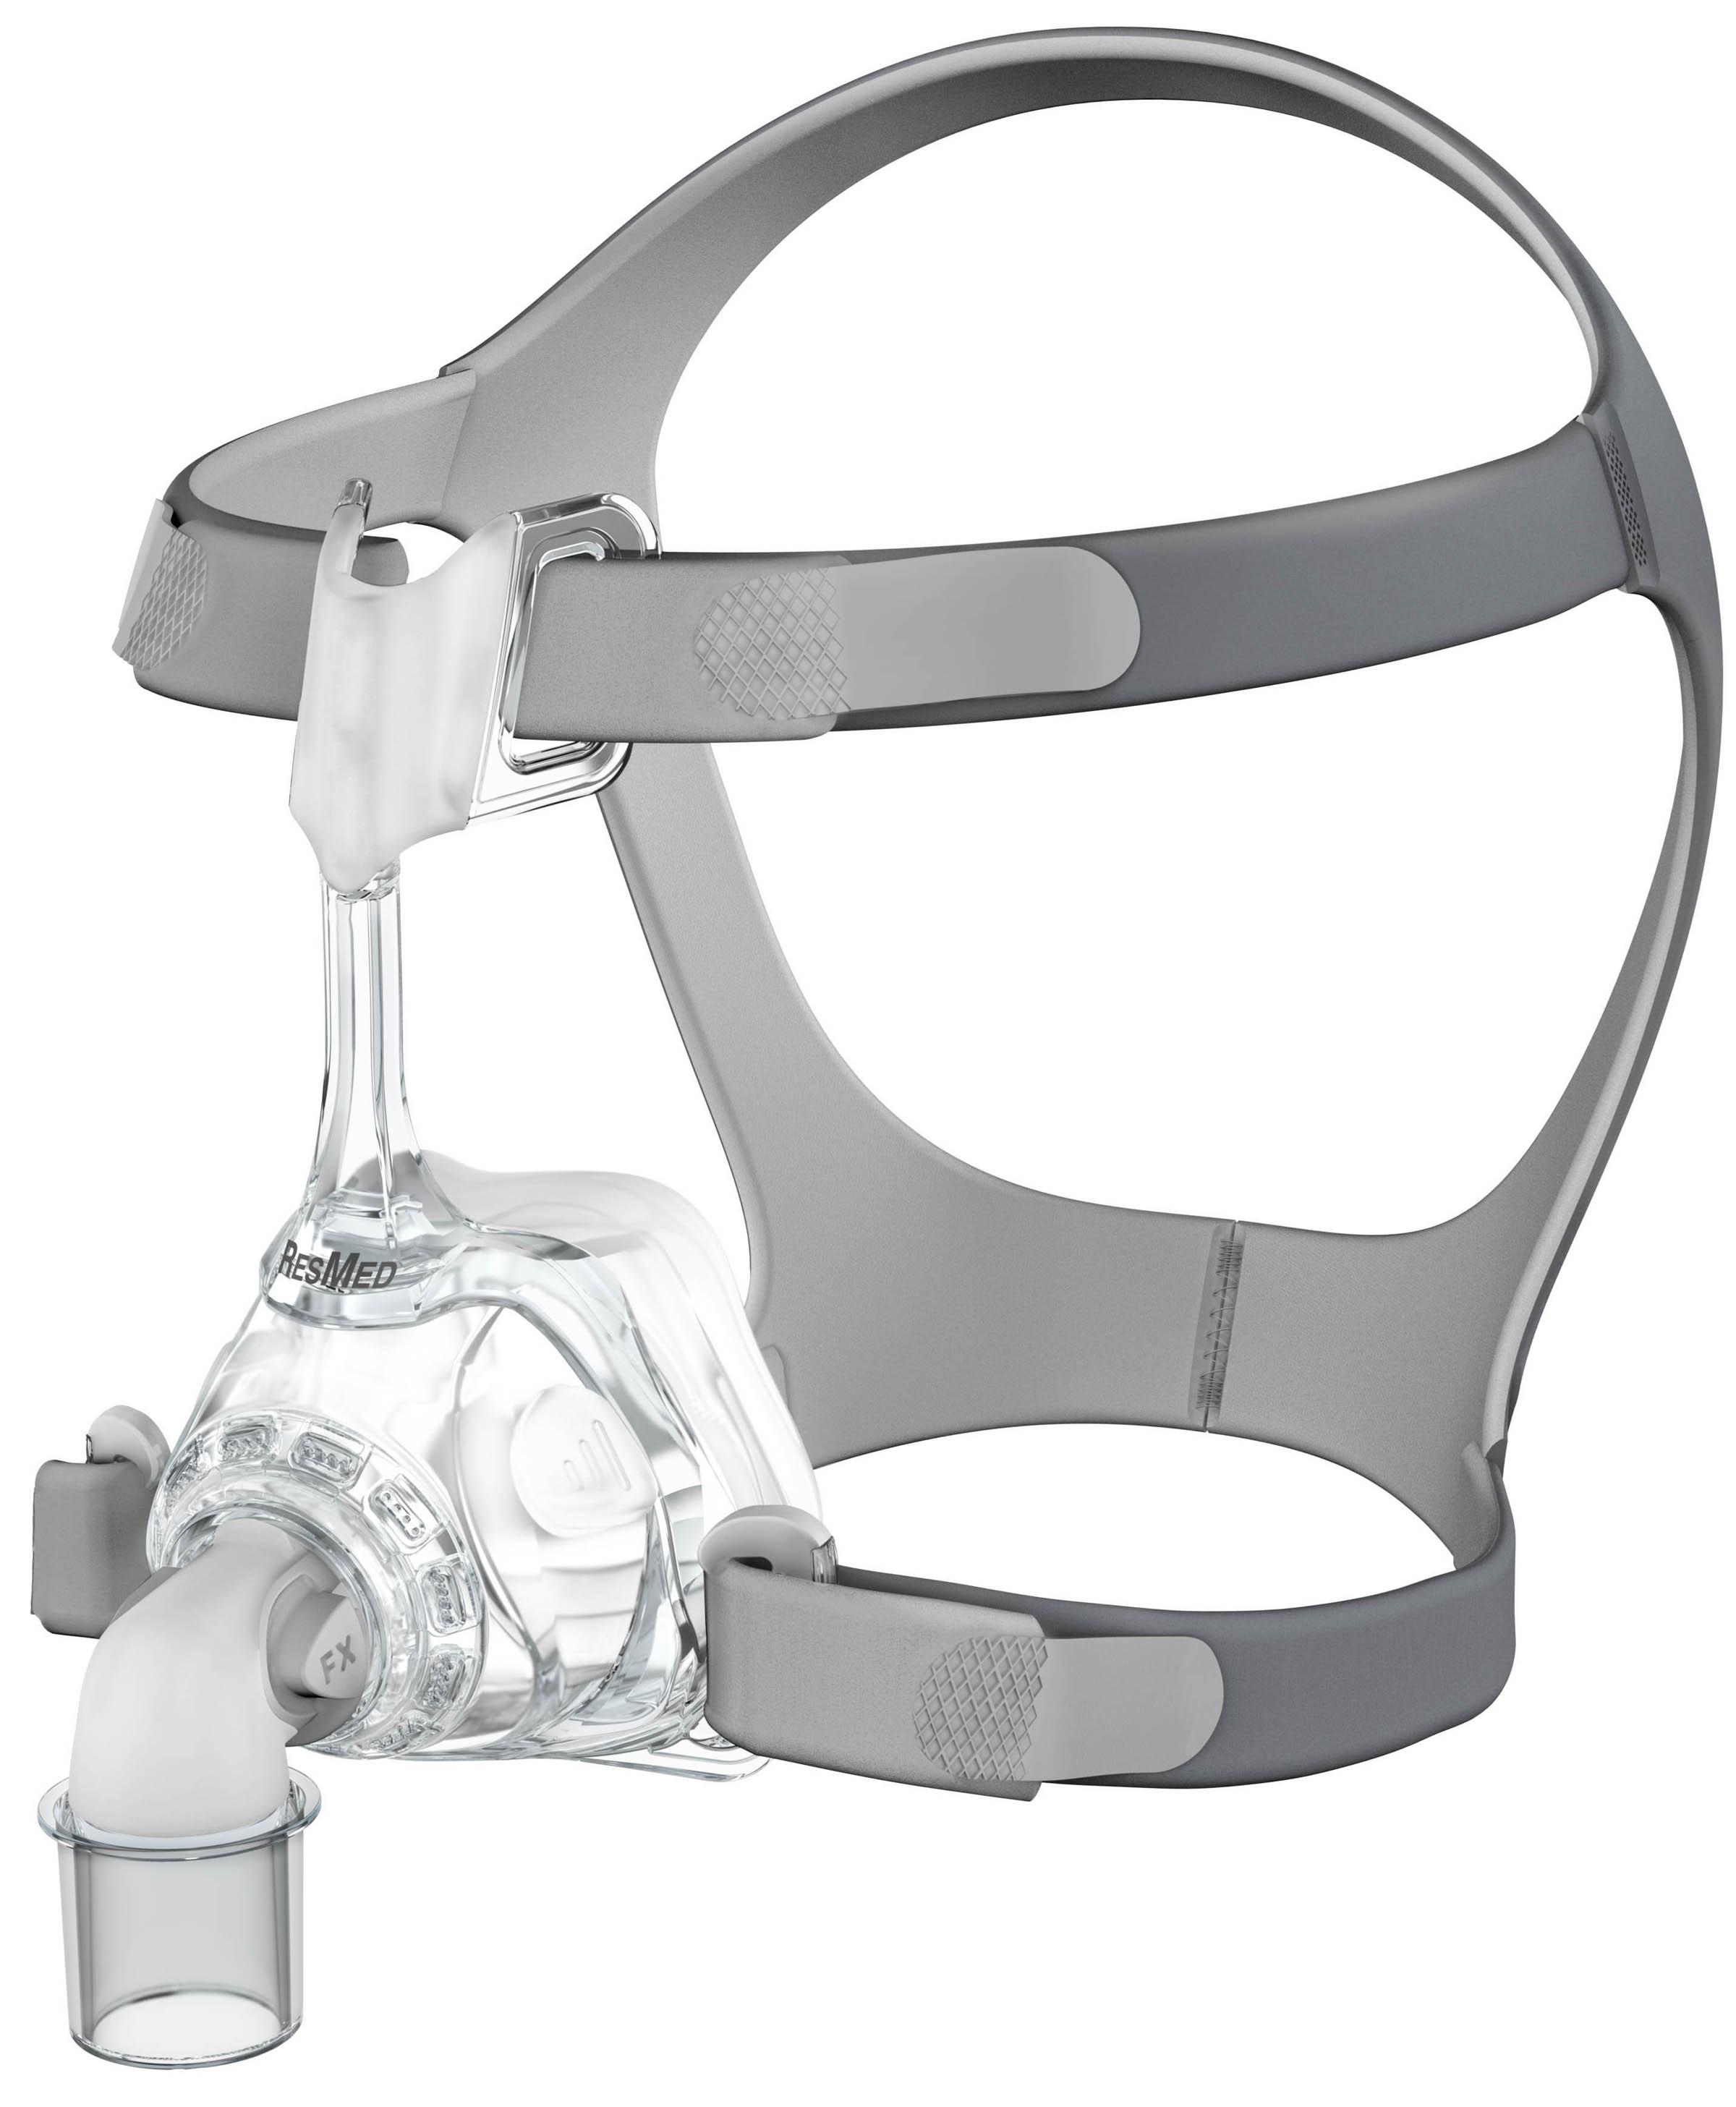 resmed-mirage-fx-nasal-mask-headgear